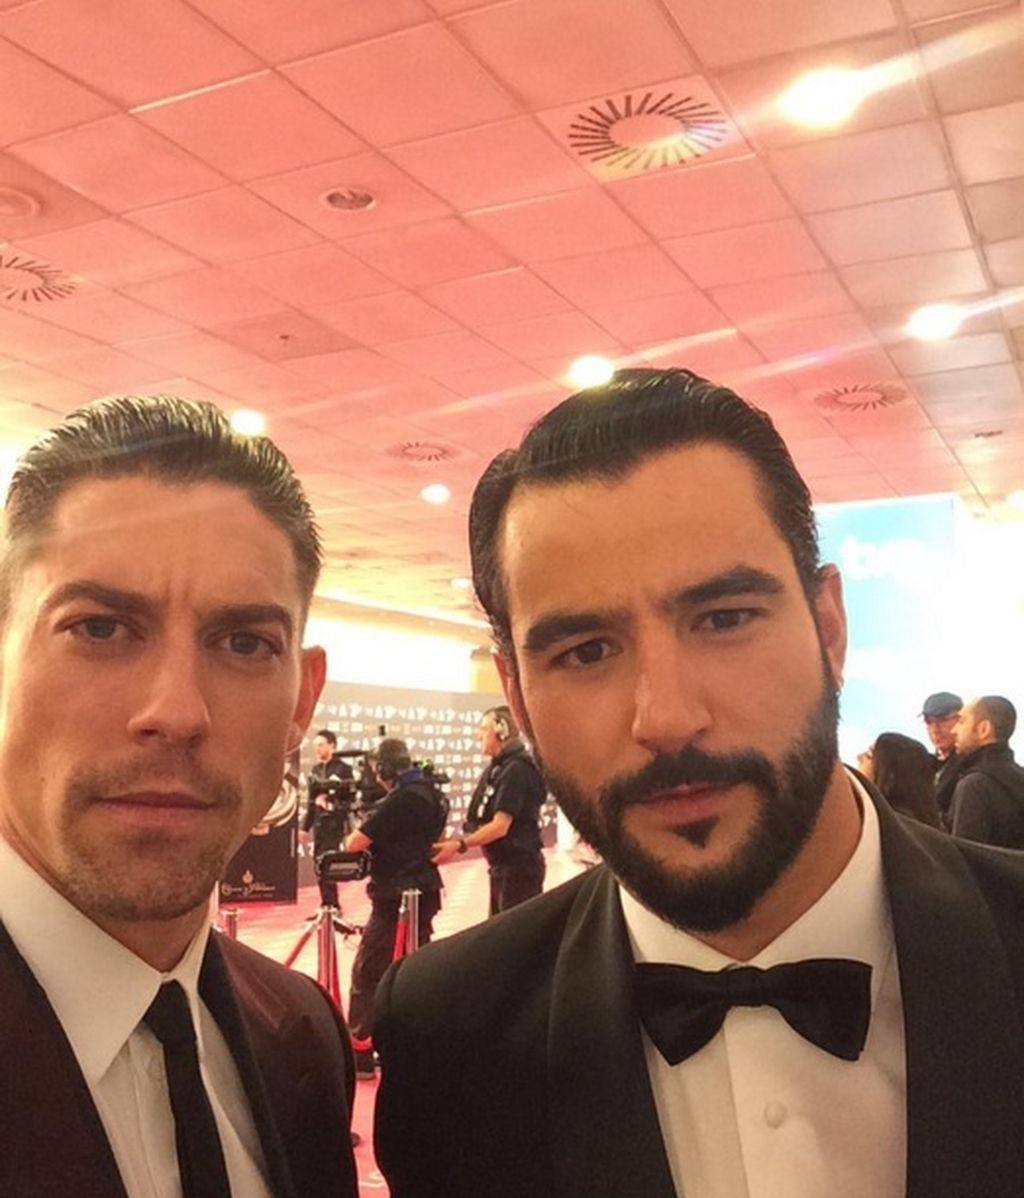 Adrián Lastra y Antonio Velázquez